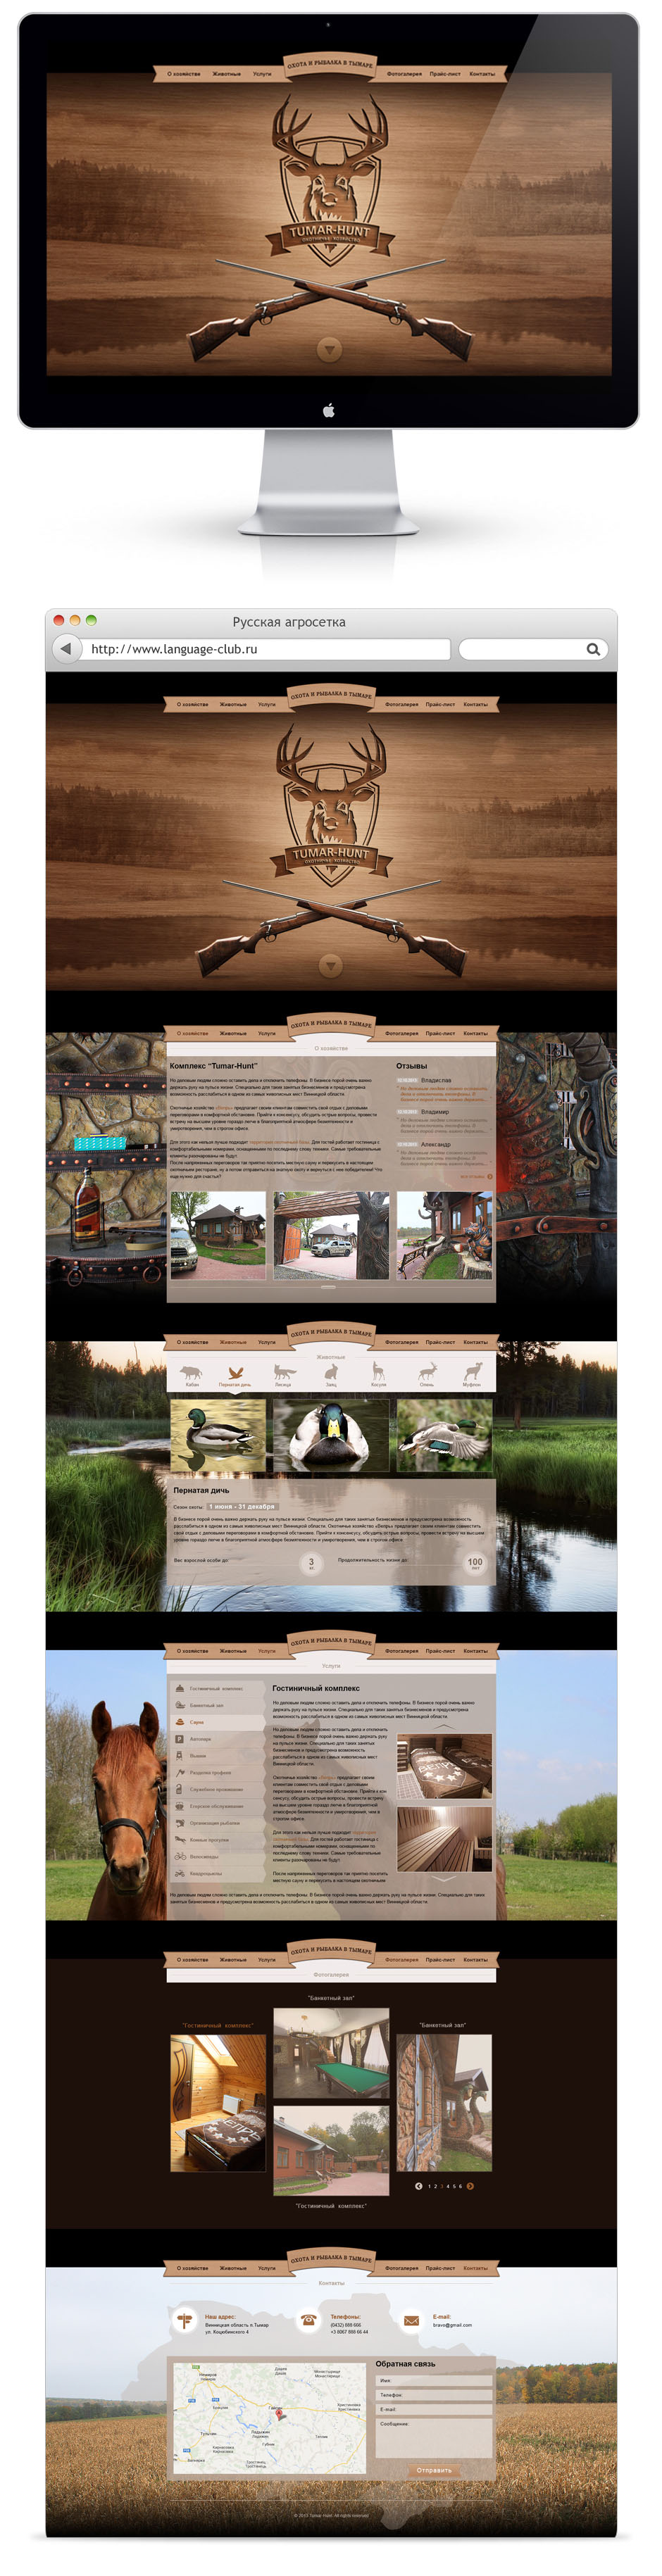 сайт охотничий усадьбы